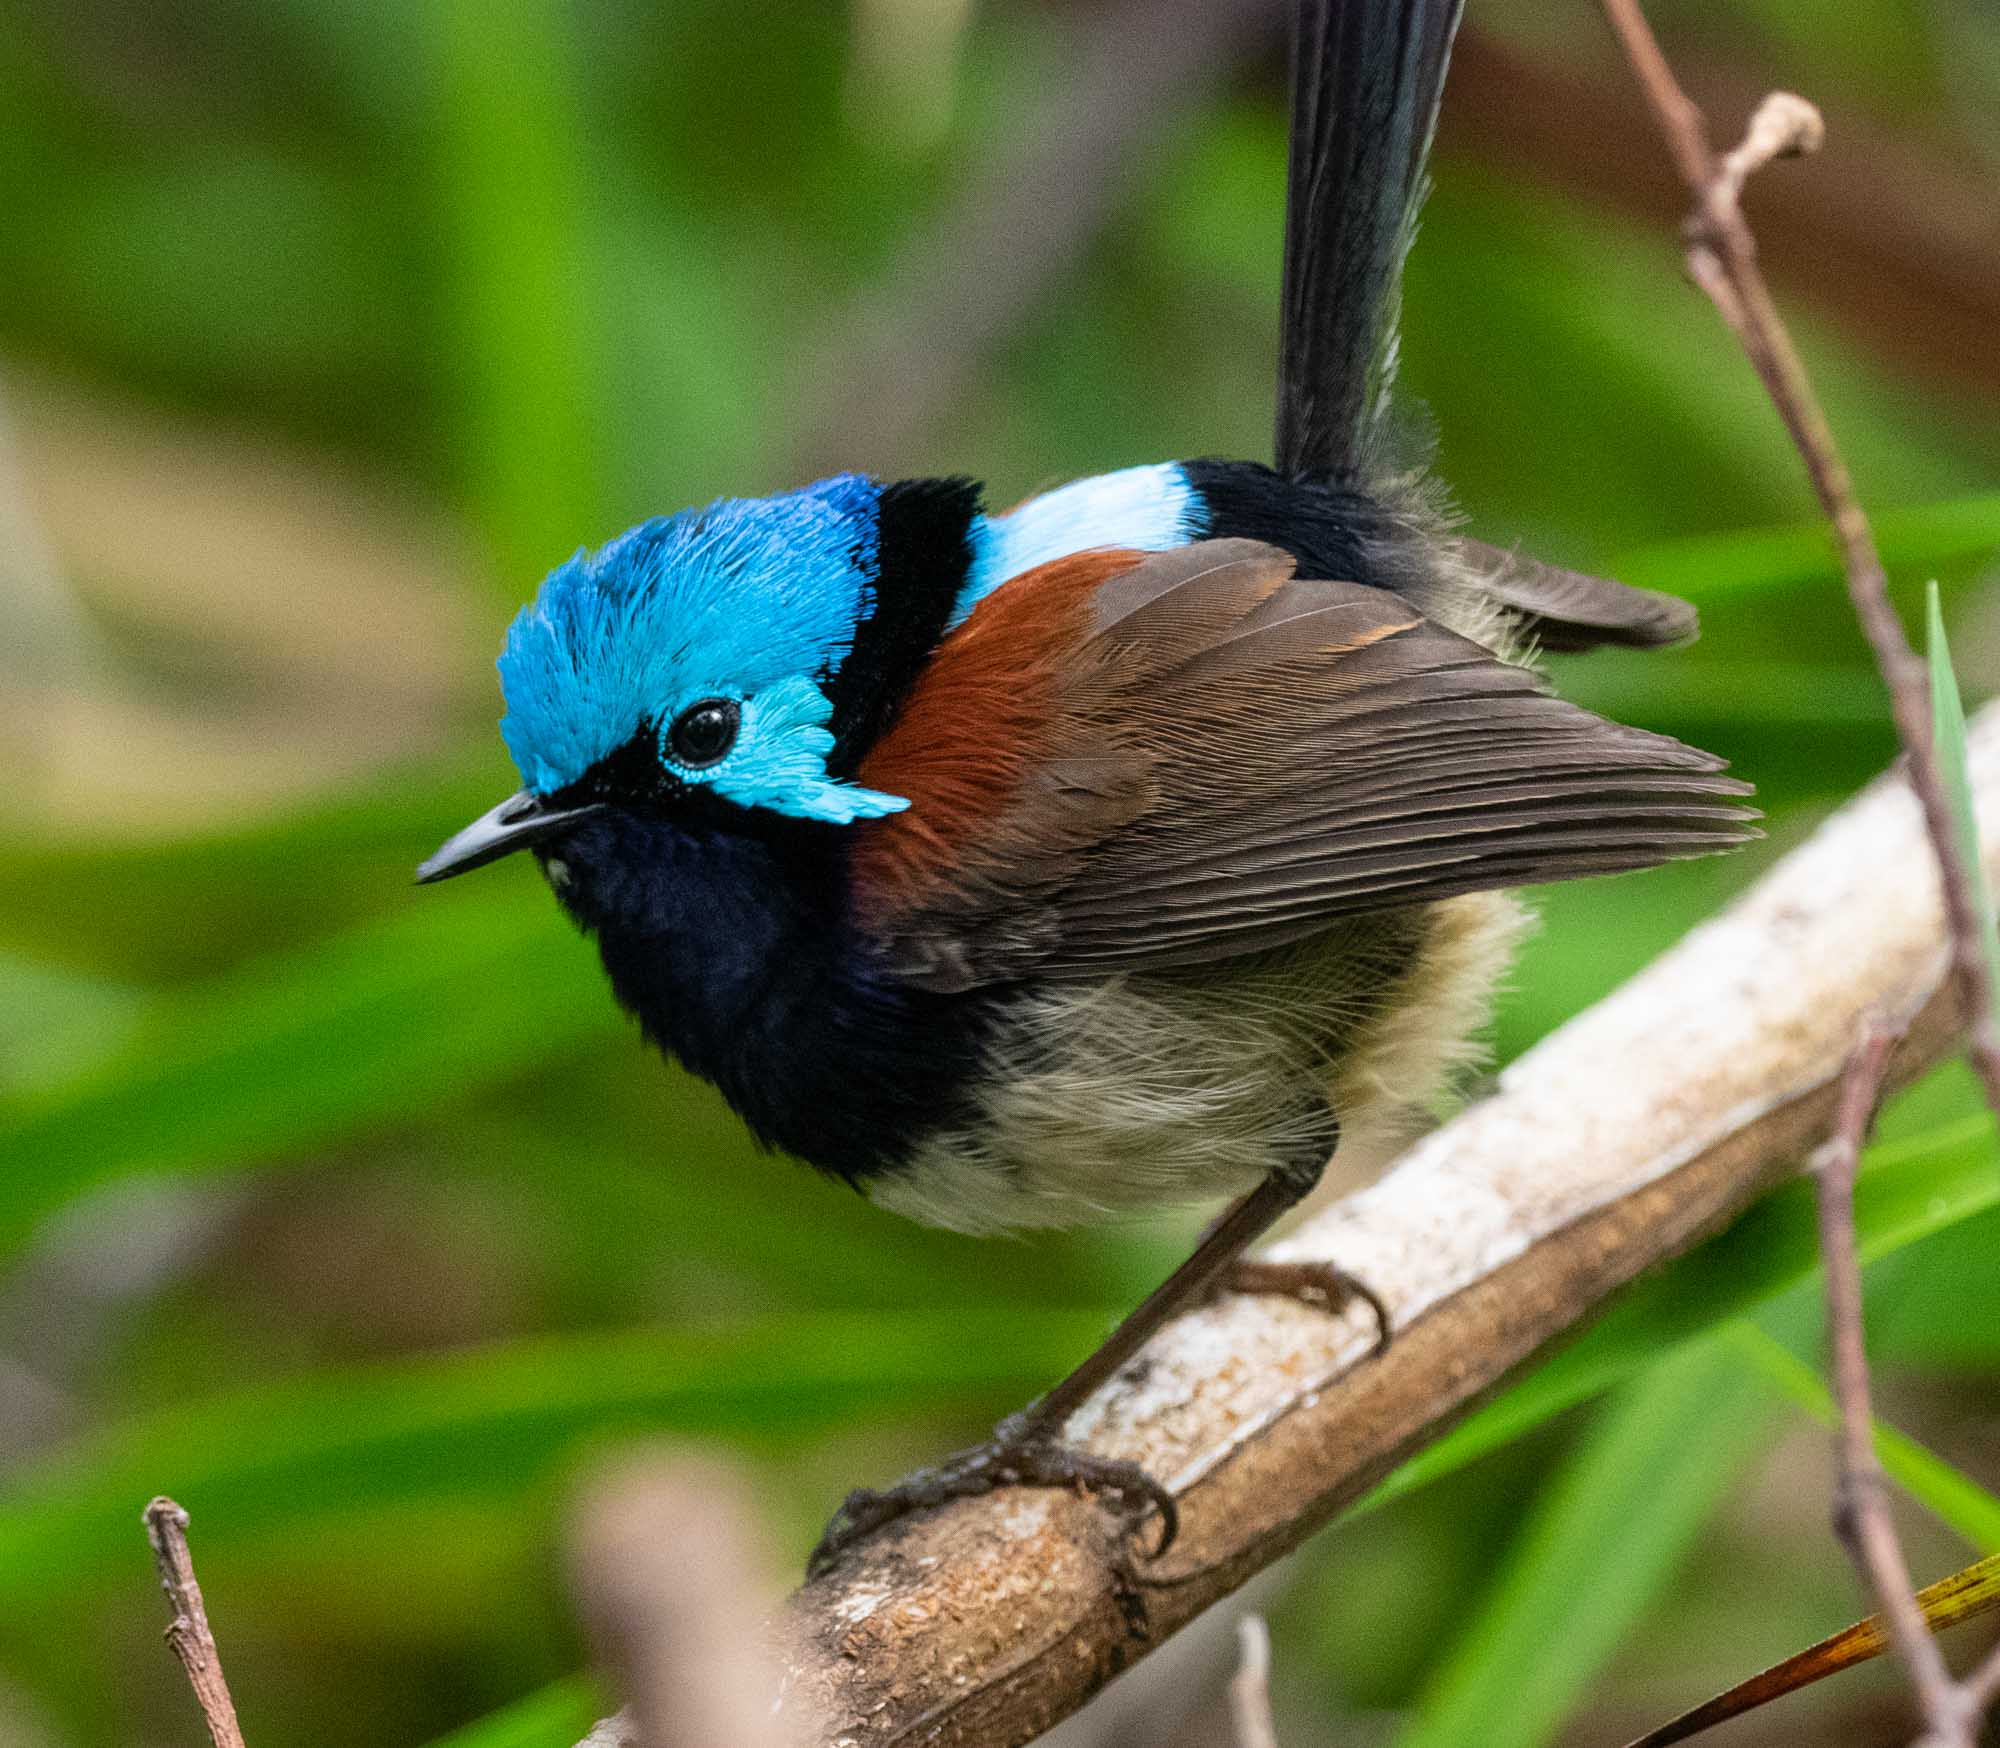 Male in full breeding plumage